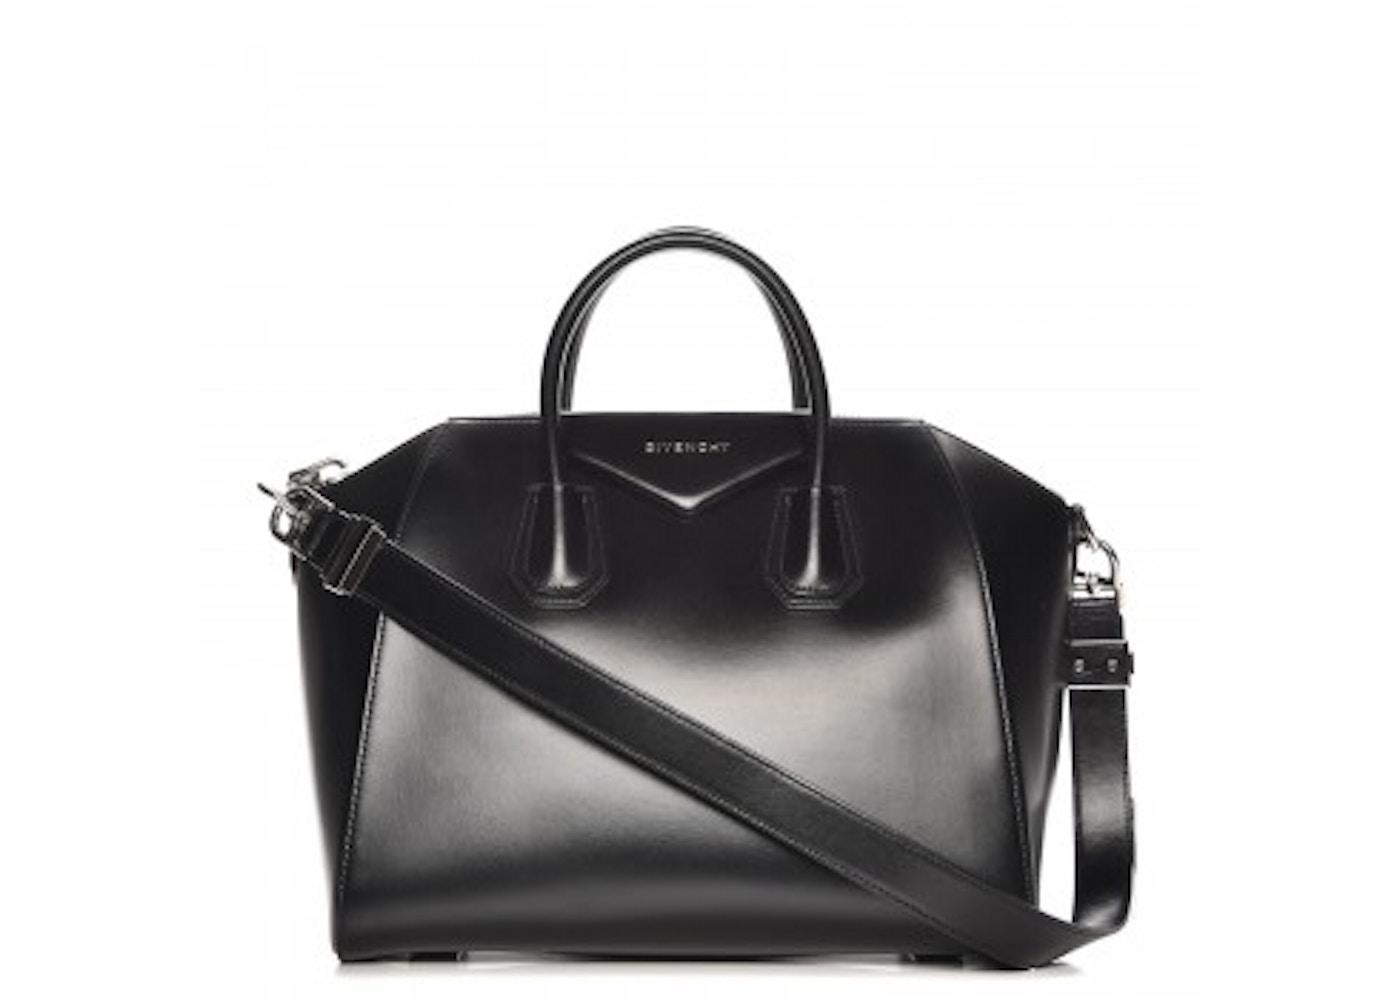 e19f2564e7 Buy & Sell Givenchy Antigona Handbags - Average Sale Price